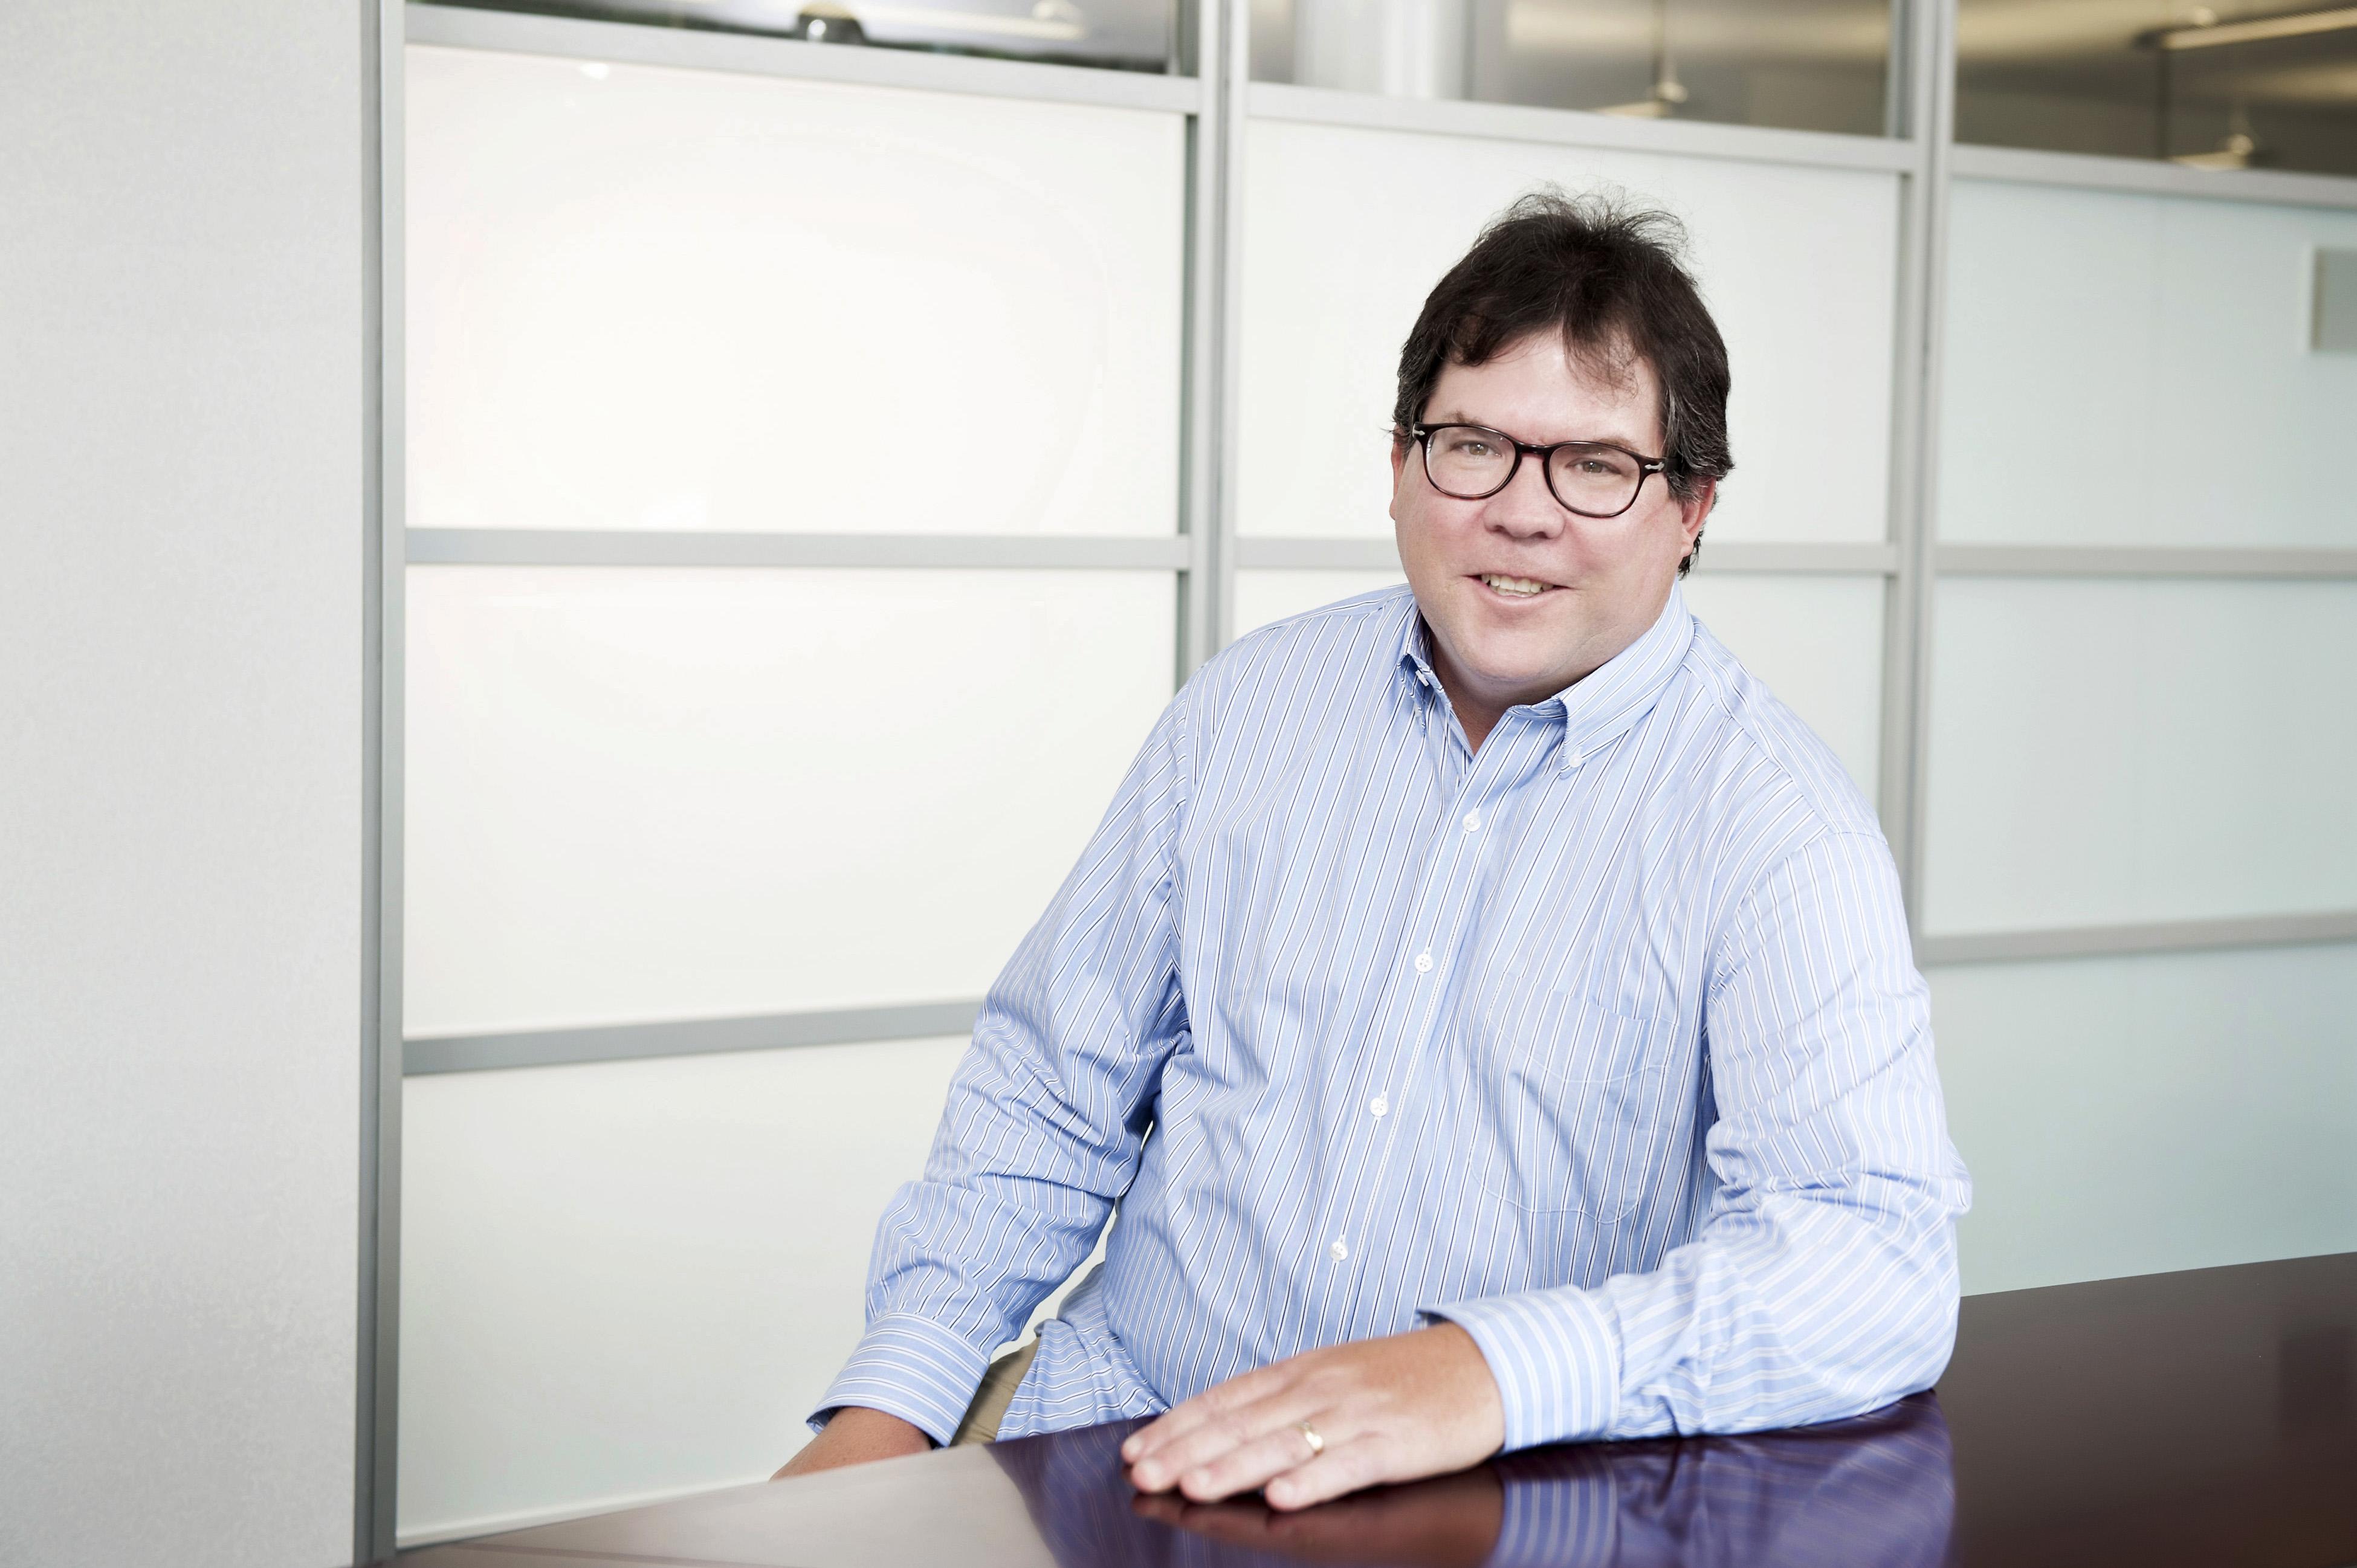 Frank Vukovits